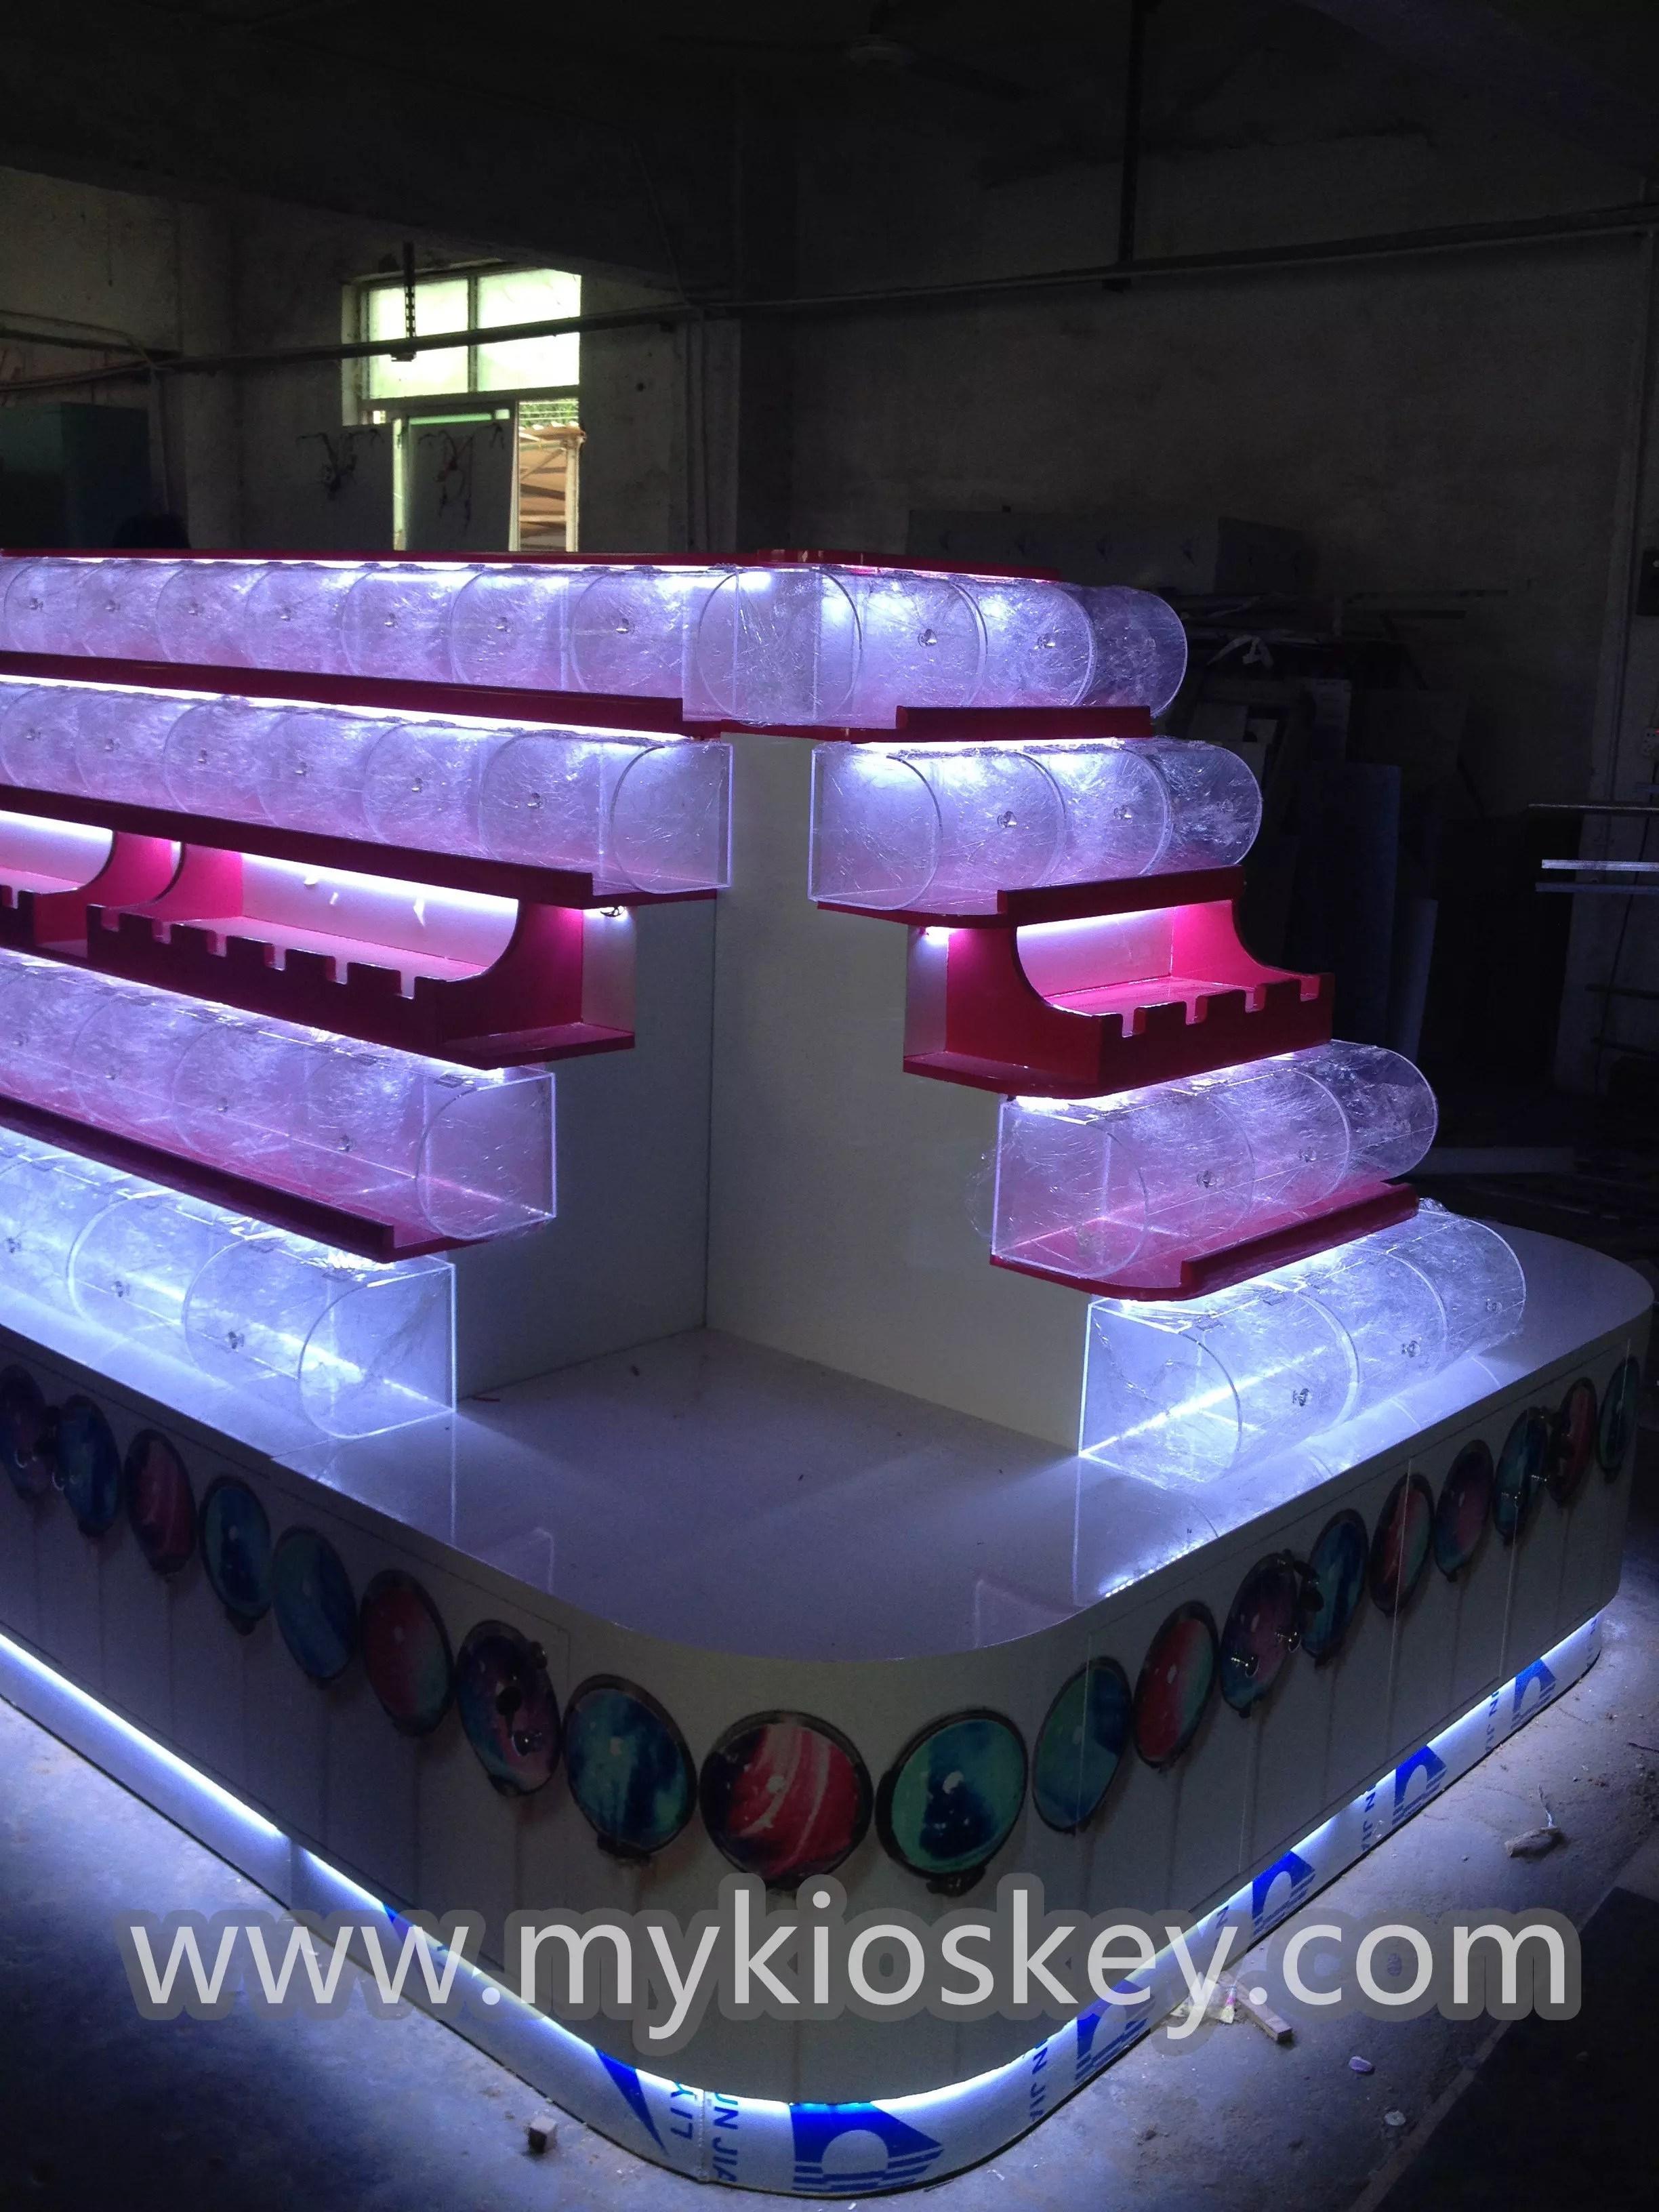 Beauty customized candy kiosk design for sale